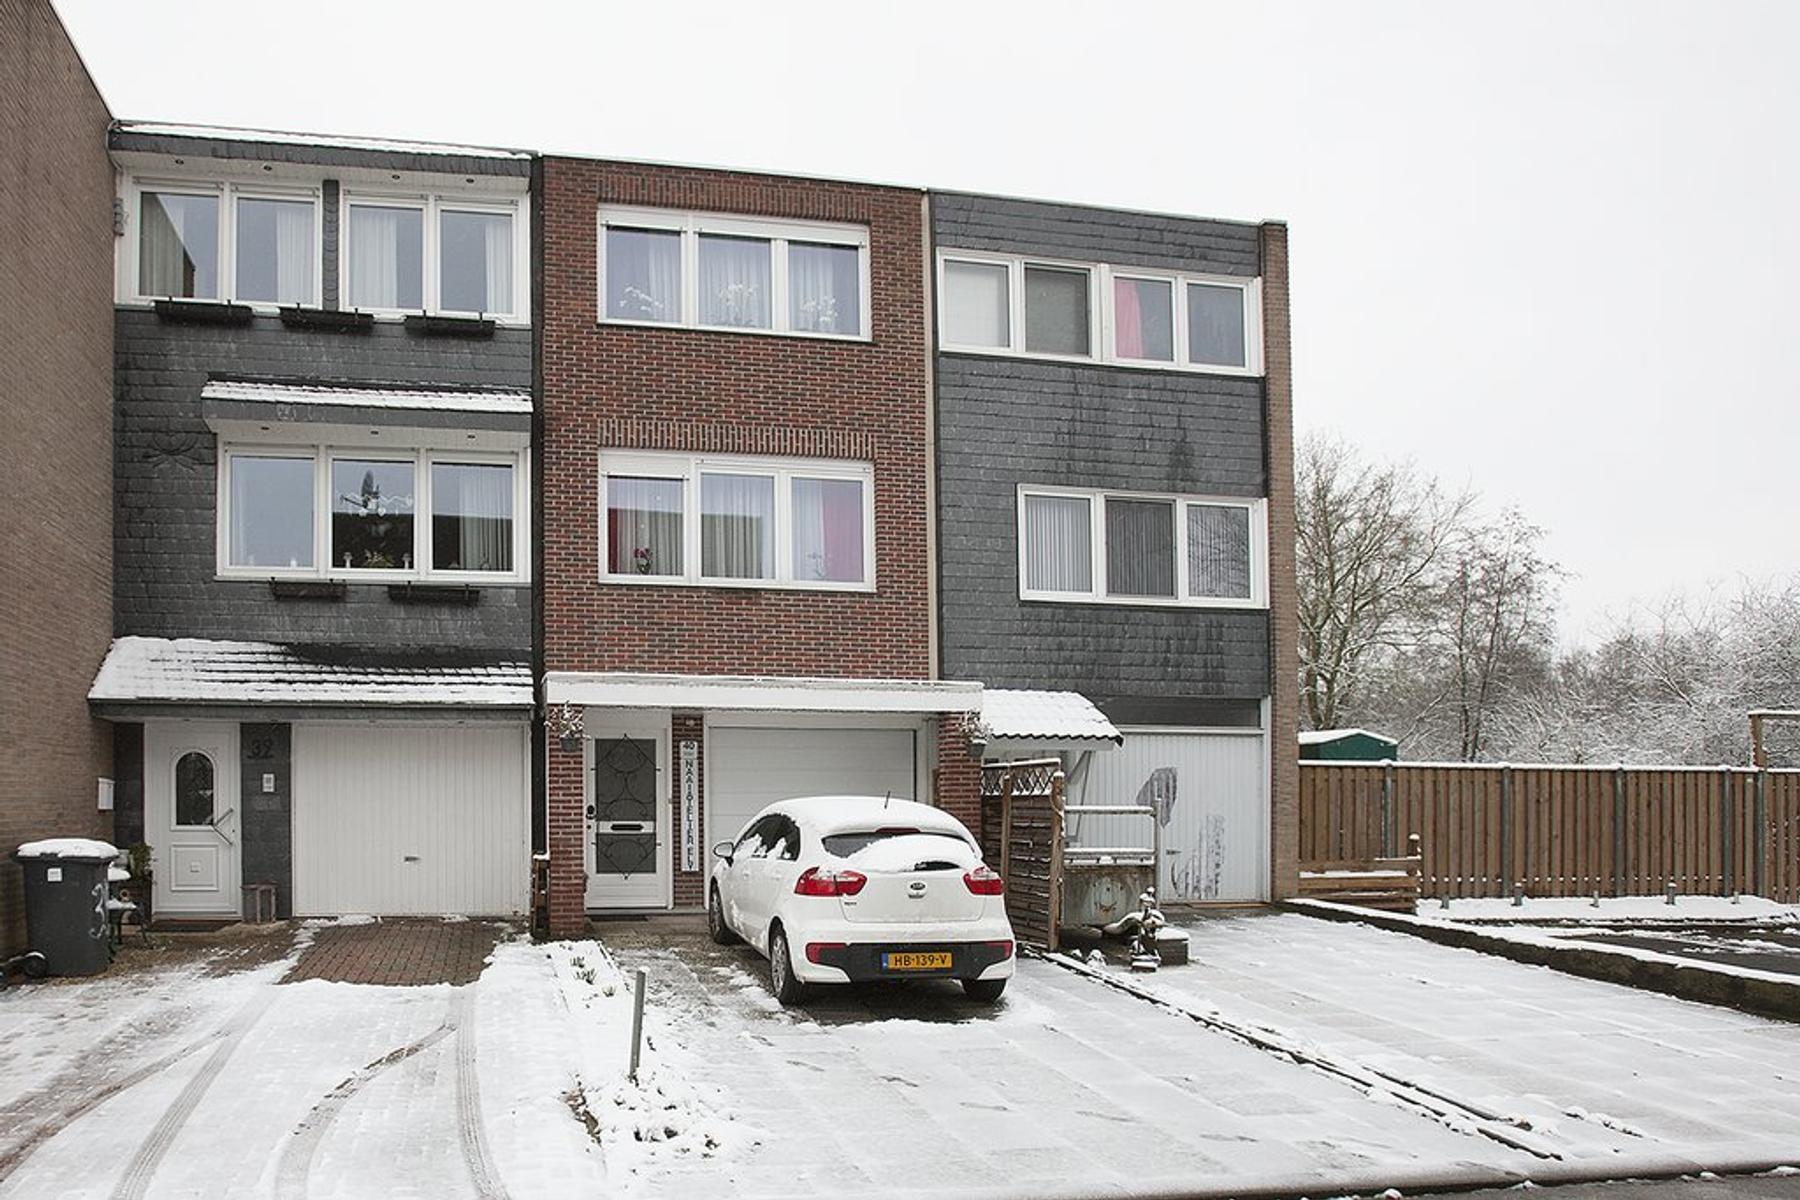 Frederika-Gracht 40 in Kerkrade 6465 CS